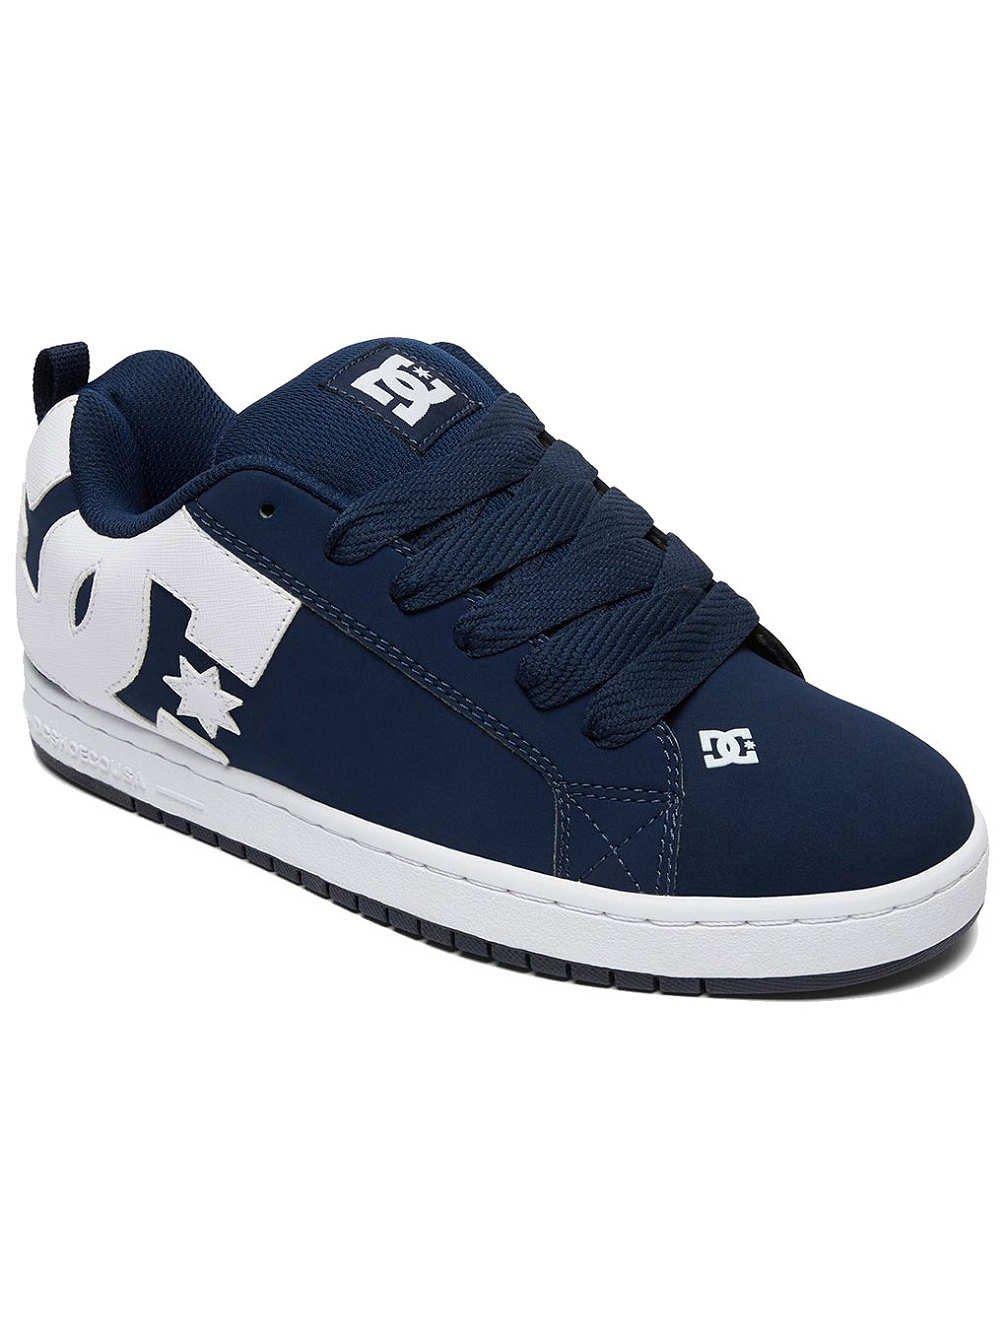 DC Shoes Court Graffik - Zapatillas para Hombre 40.5 EU|Navy White Navy White